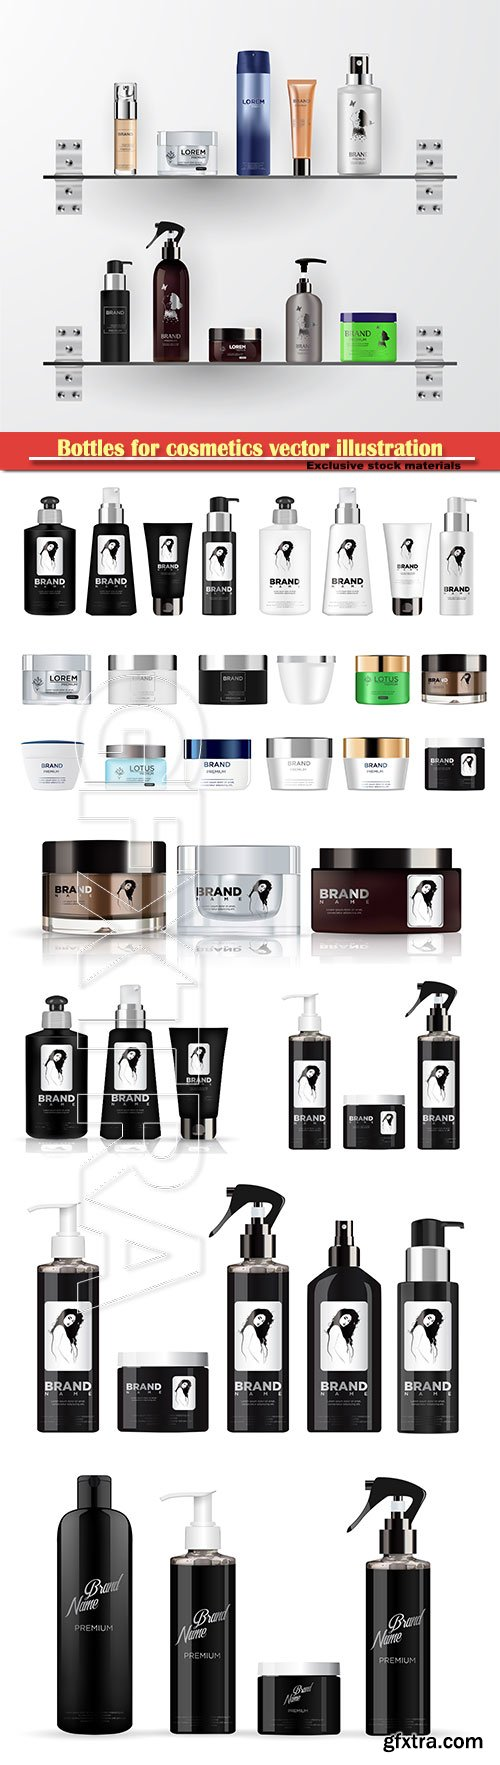 Bottles for cosmetics vector illustration # 2